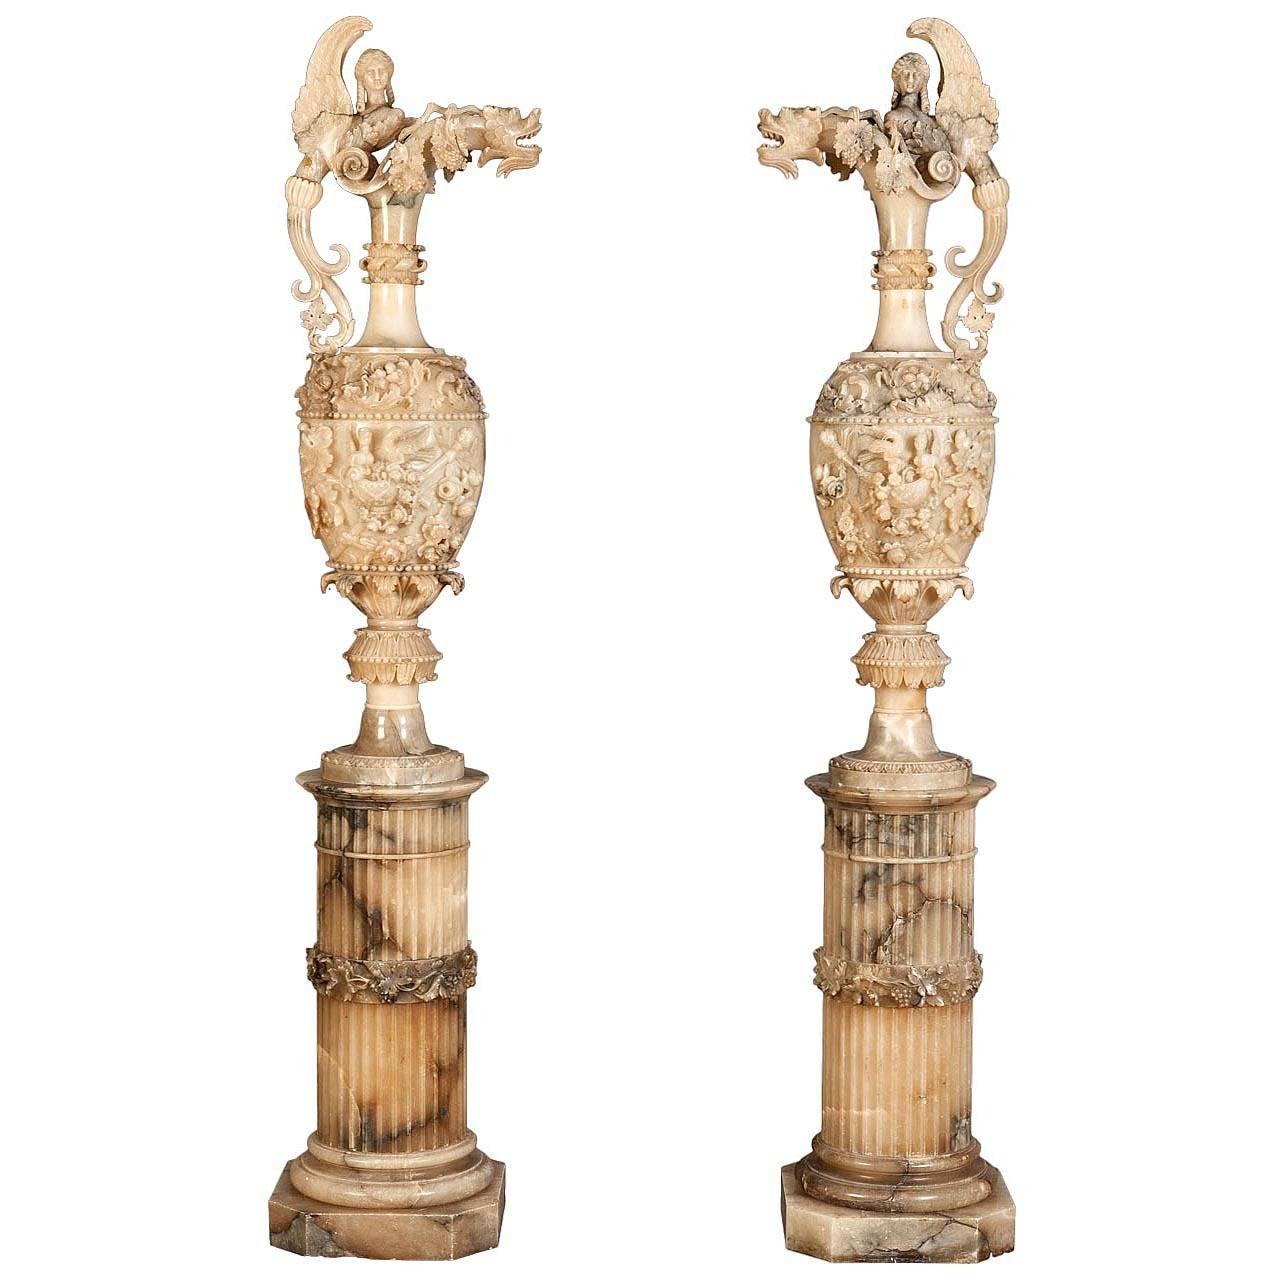 Pair of Monumental Alabaster Sculptures in the Neo-Renaissance Manner